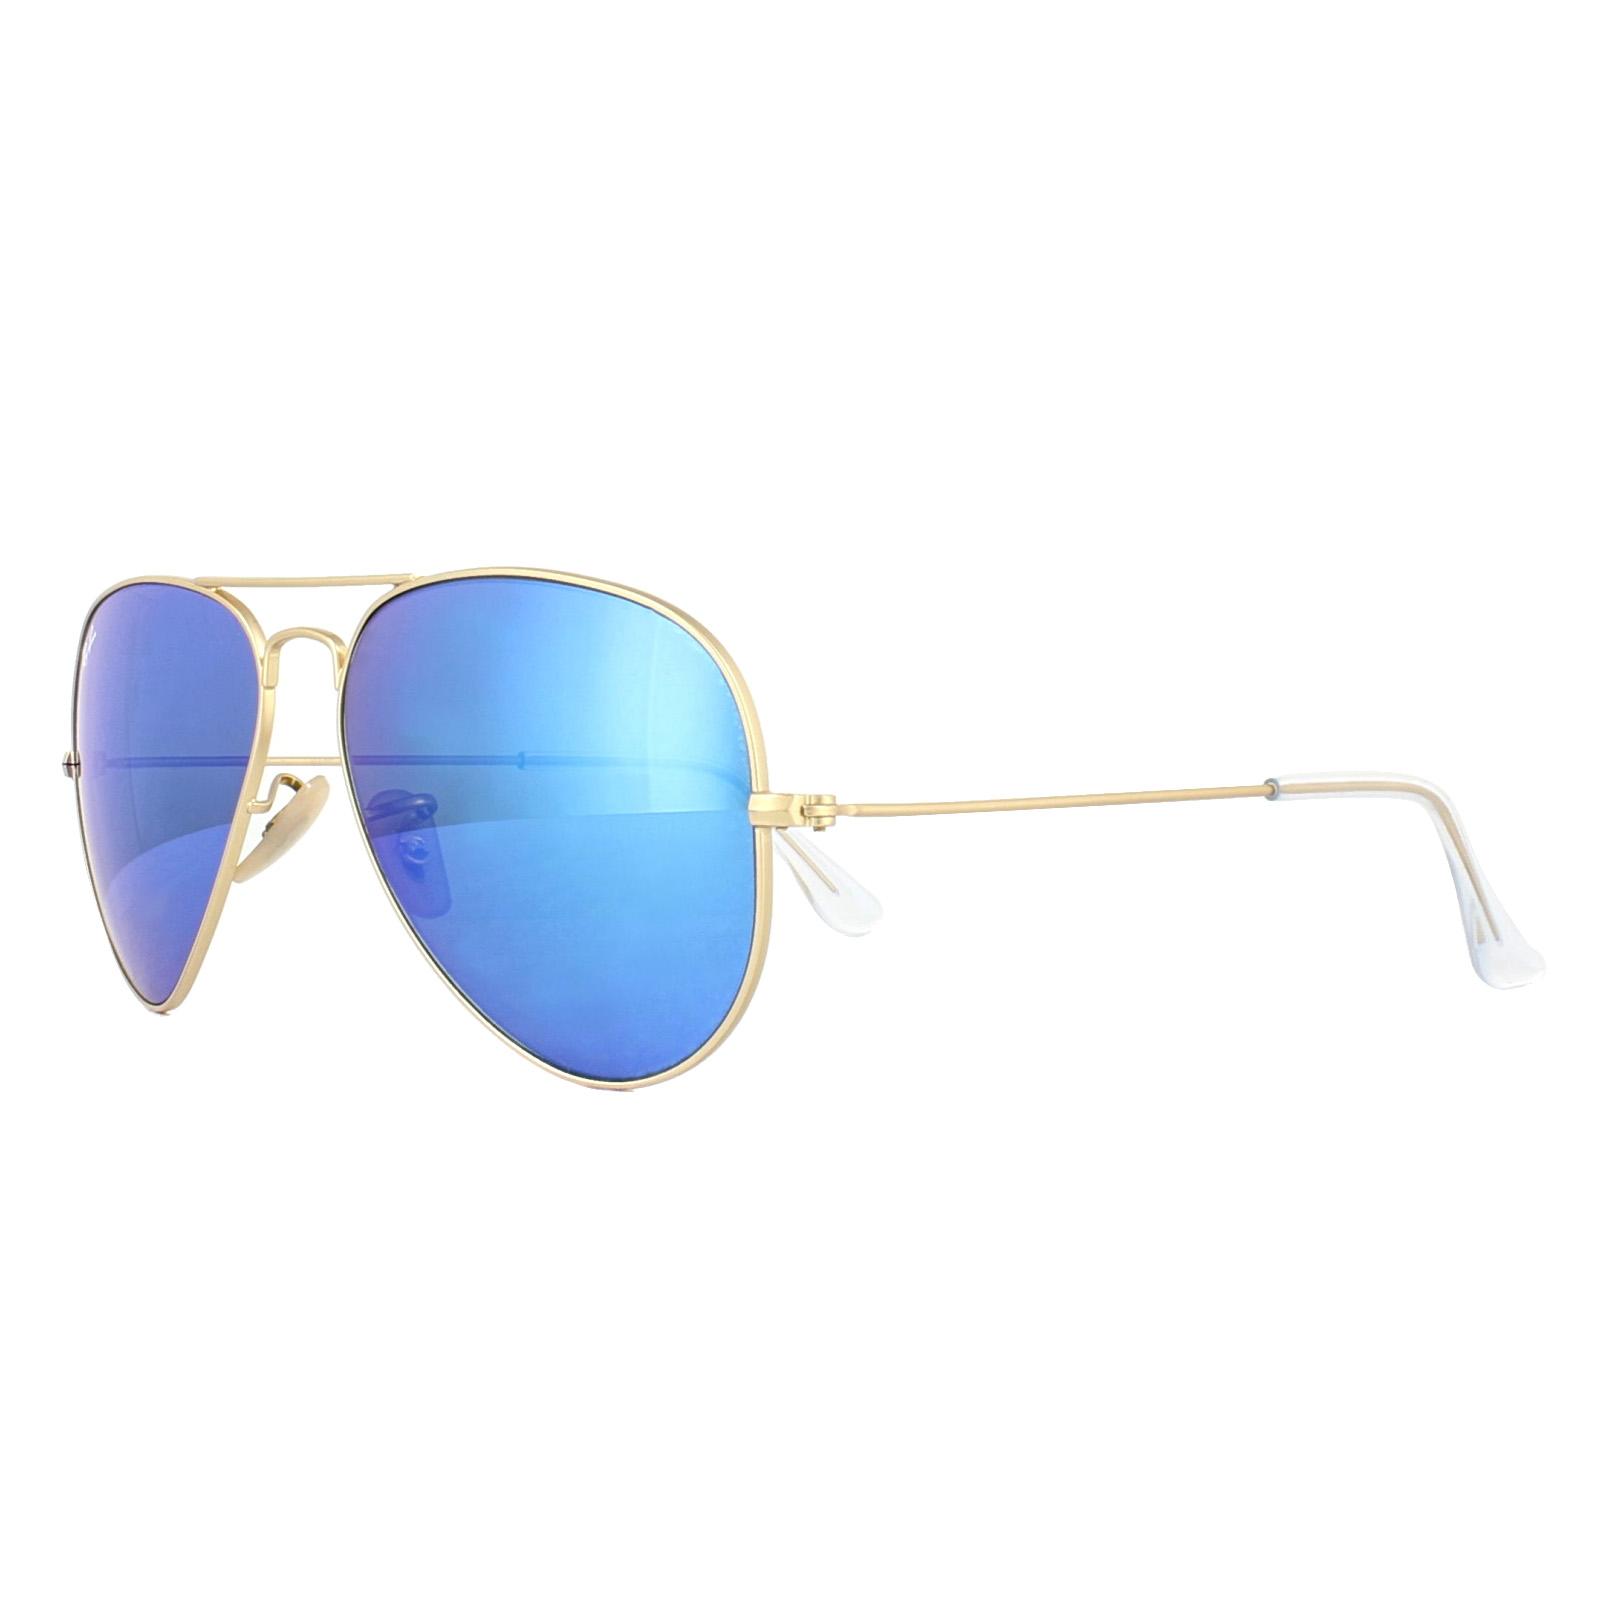 afa2cd0f8f49e CENTINELA Ray-Ban gafas de sol Aviator 3025 112 17 Matt Gold espejo azul  pequeño